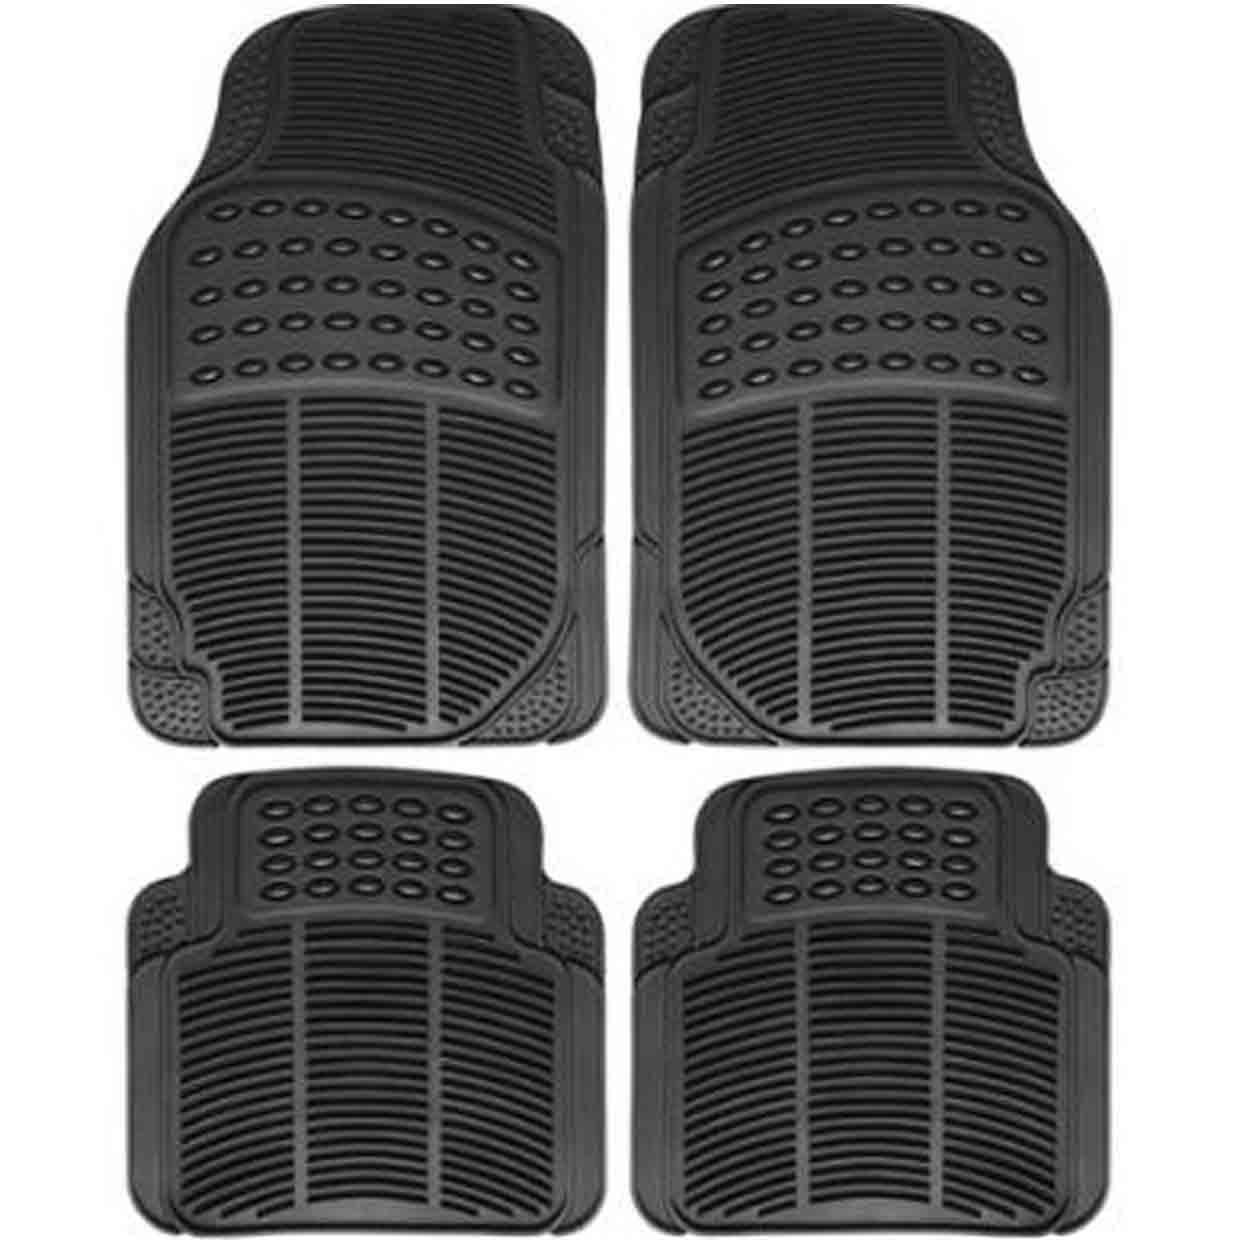 hight resolution of universal car mat rubber car matting 4pcs set black